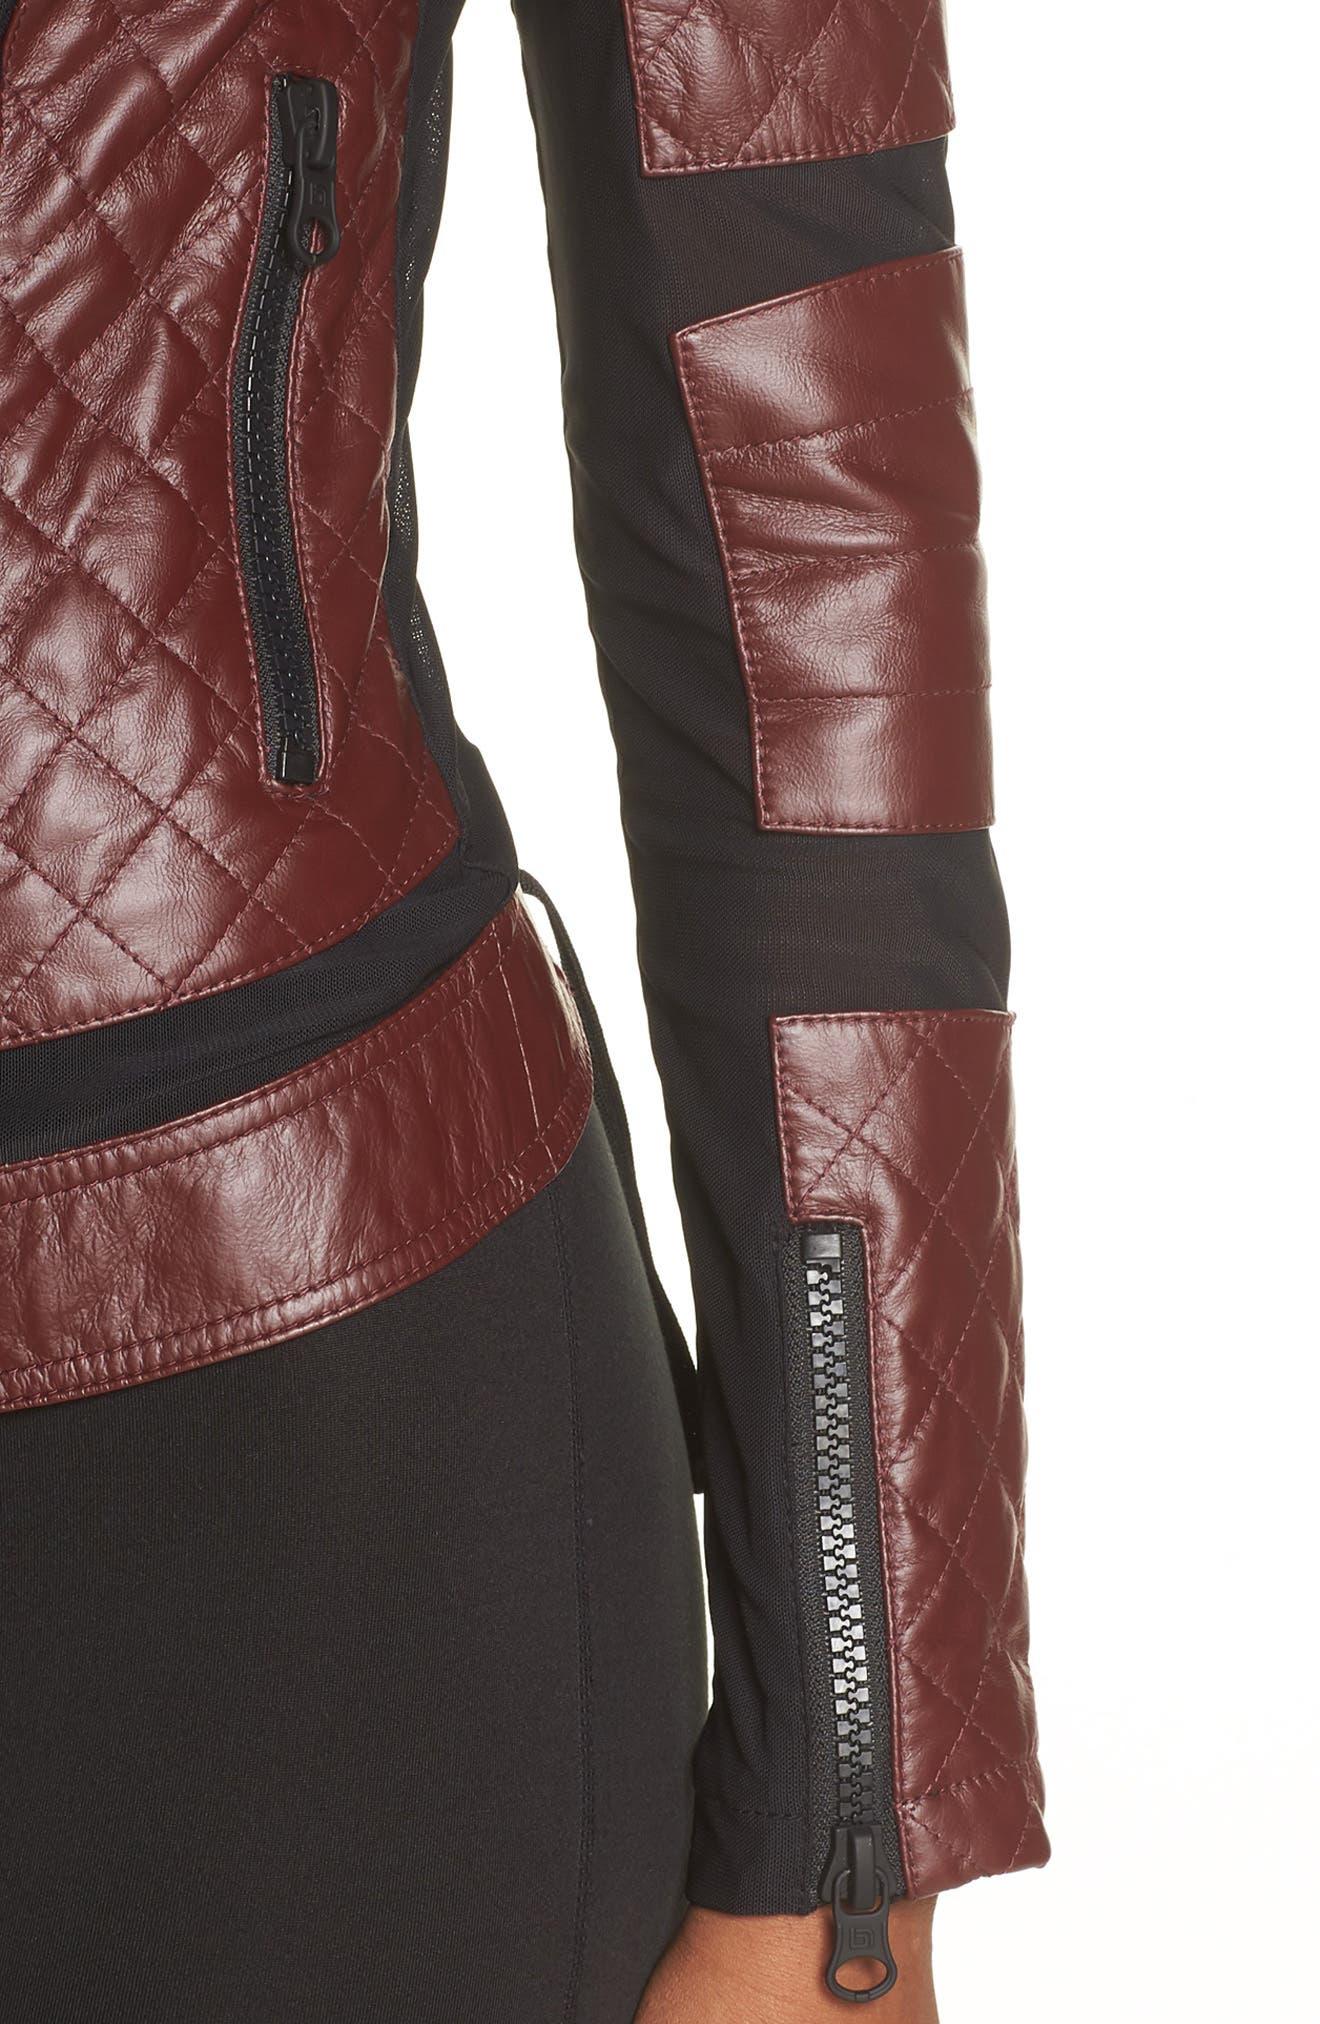 BLANC NOIR, Voyage Hooded Leather & Mesh Moto Jacket, Alternate thumbnail 5, color, 601